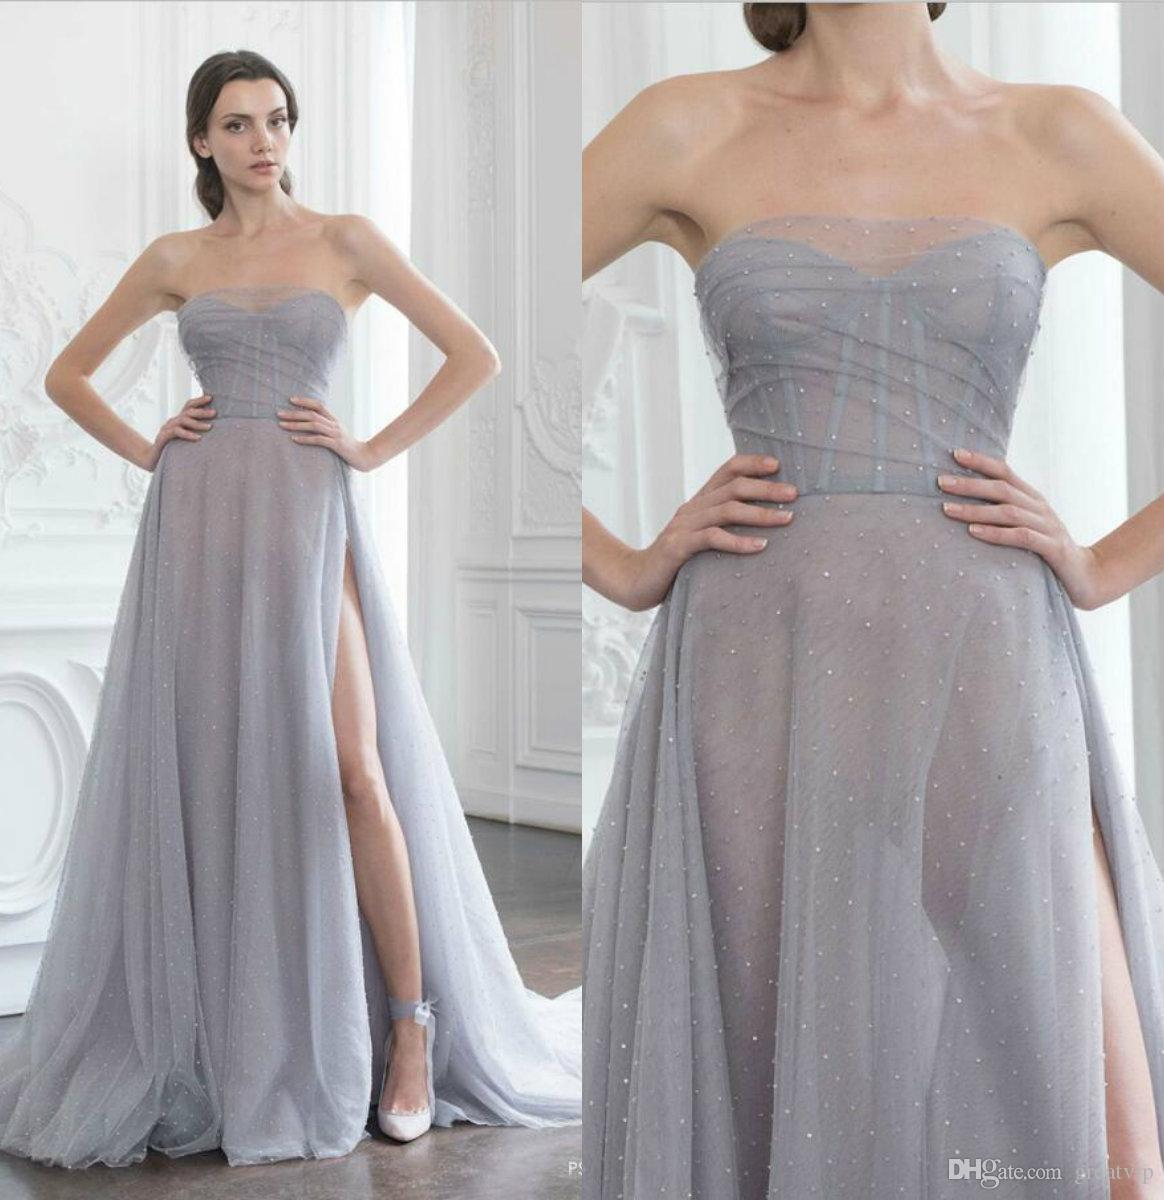 Paolo Sebastian 2019 Evening Dresses Beaded High Split Sweetheart Sexy  Bling Prom Dress Party Bridal Guest Gowns Plus Size Robes De Soirée Evening  Dresses ... 81d2d7cd6